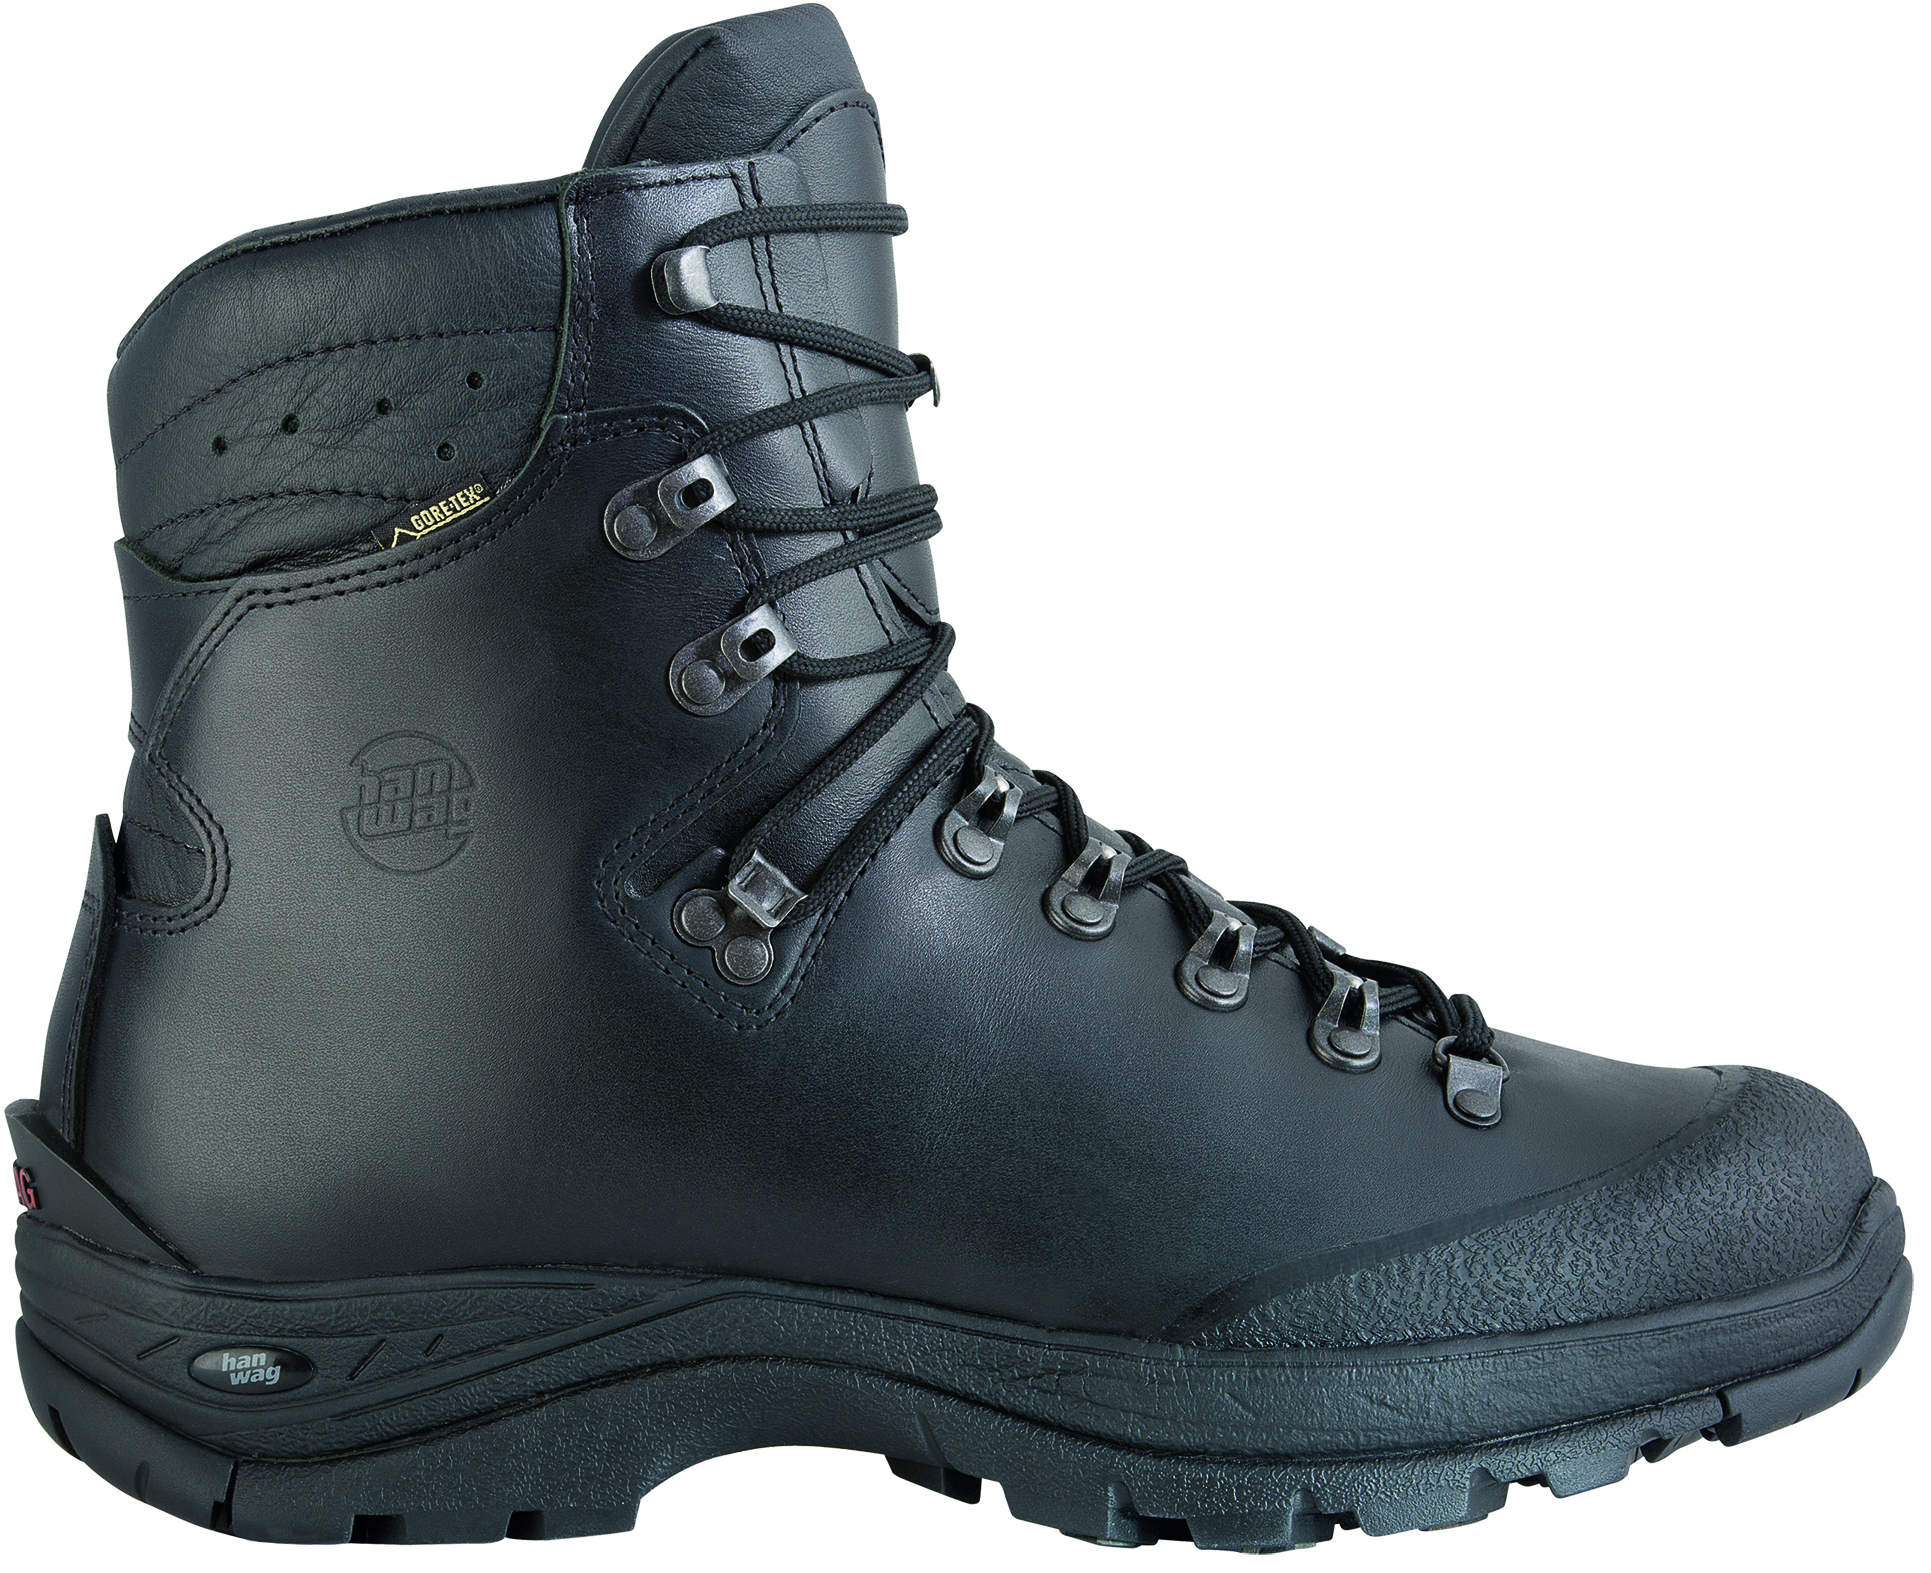 c9679eb6a3e Hanwag Alaska Winter GTX Backpacking Boot - Mens